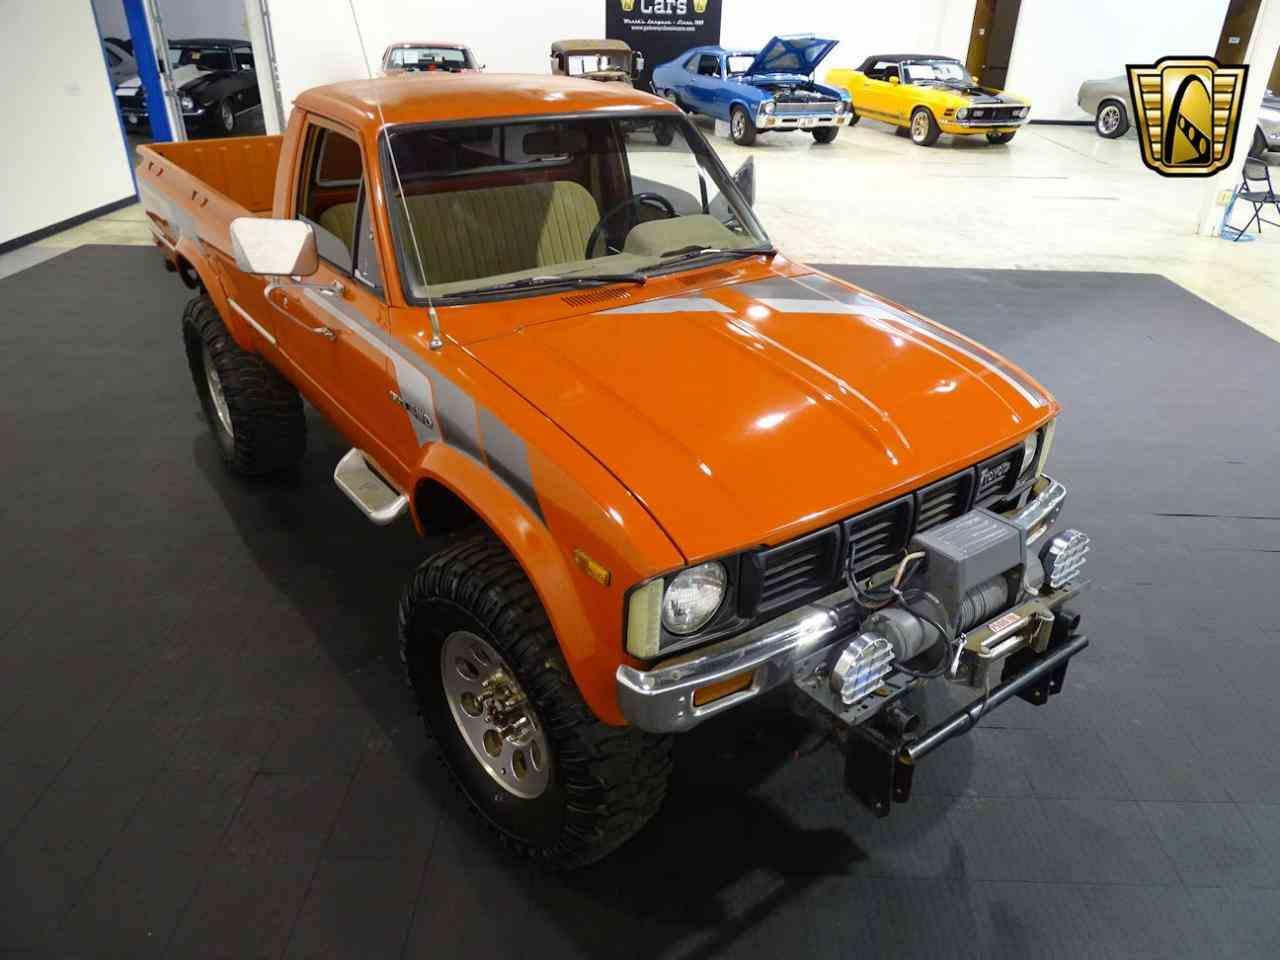 1980 Toyota Pickup for Sale ClassicCarscom CC 1091087